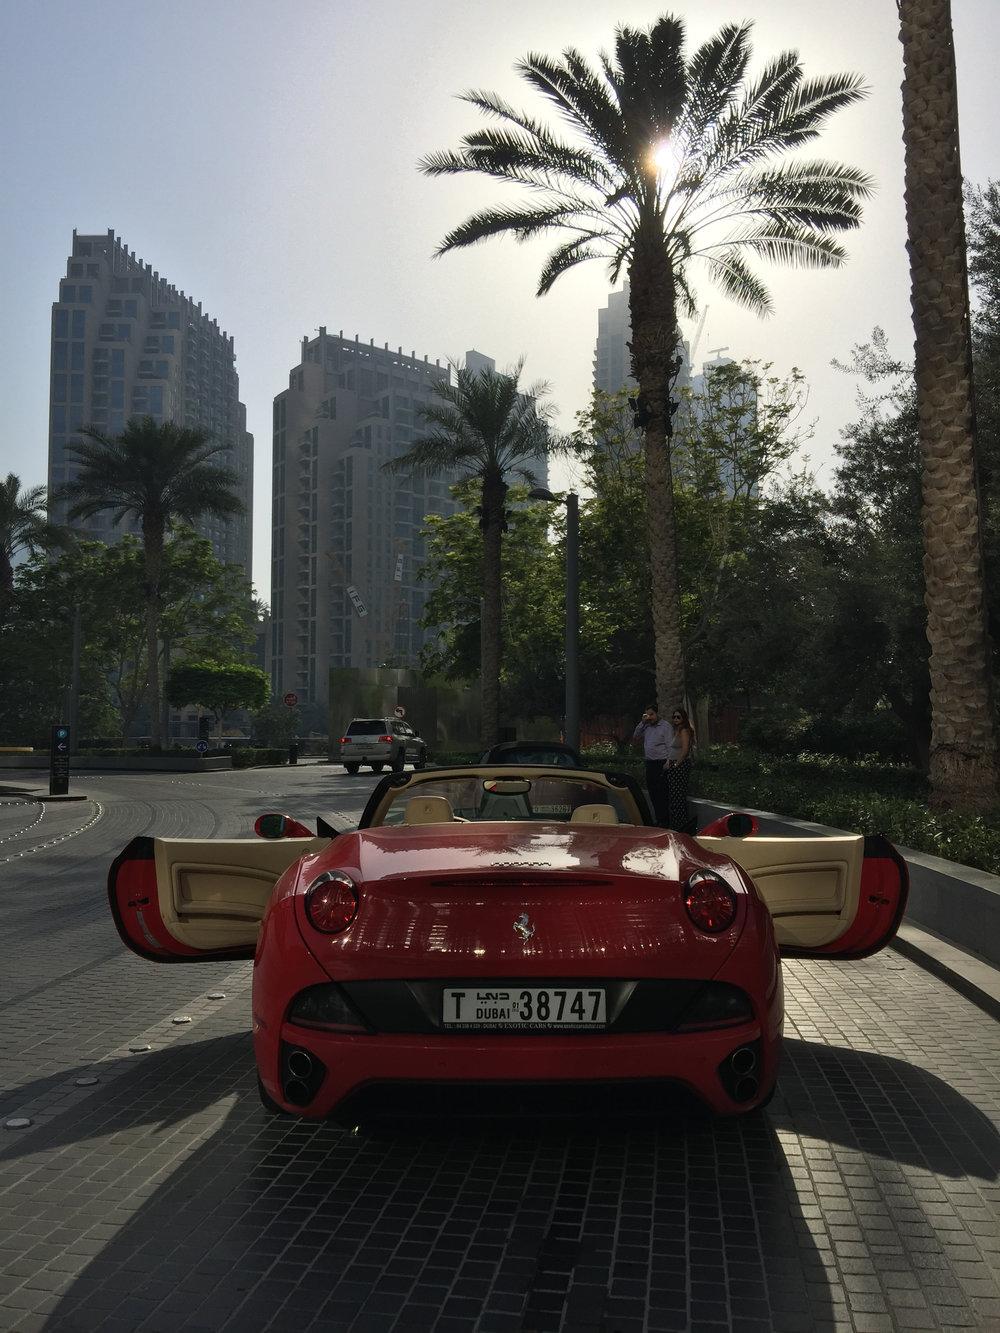 parked out side th burj with ferrari dubai burj khalifa room travel blogger influencer vlogger carla maria bruno advantures.jpg